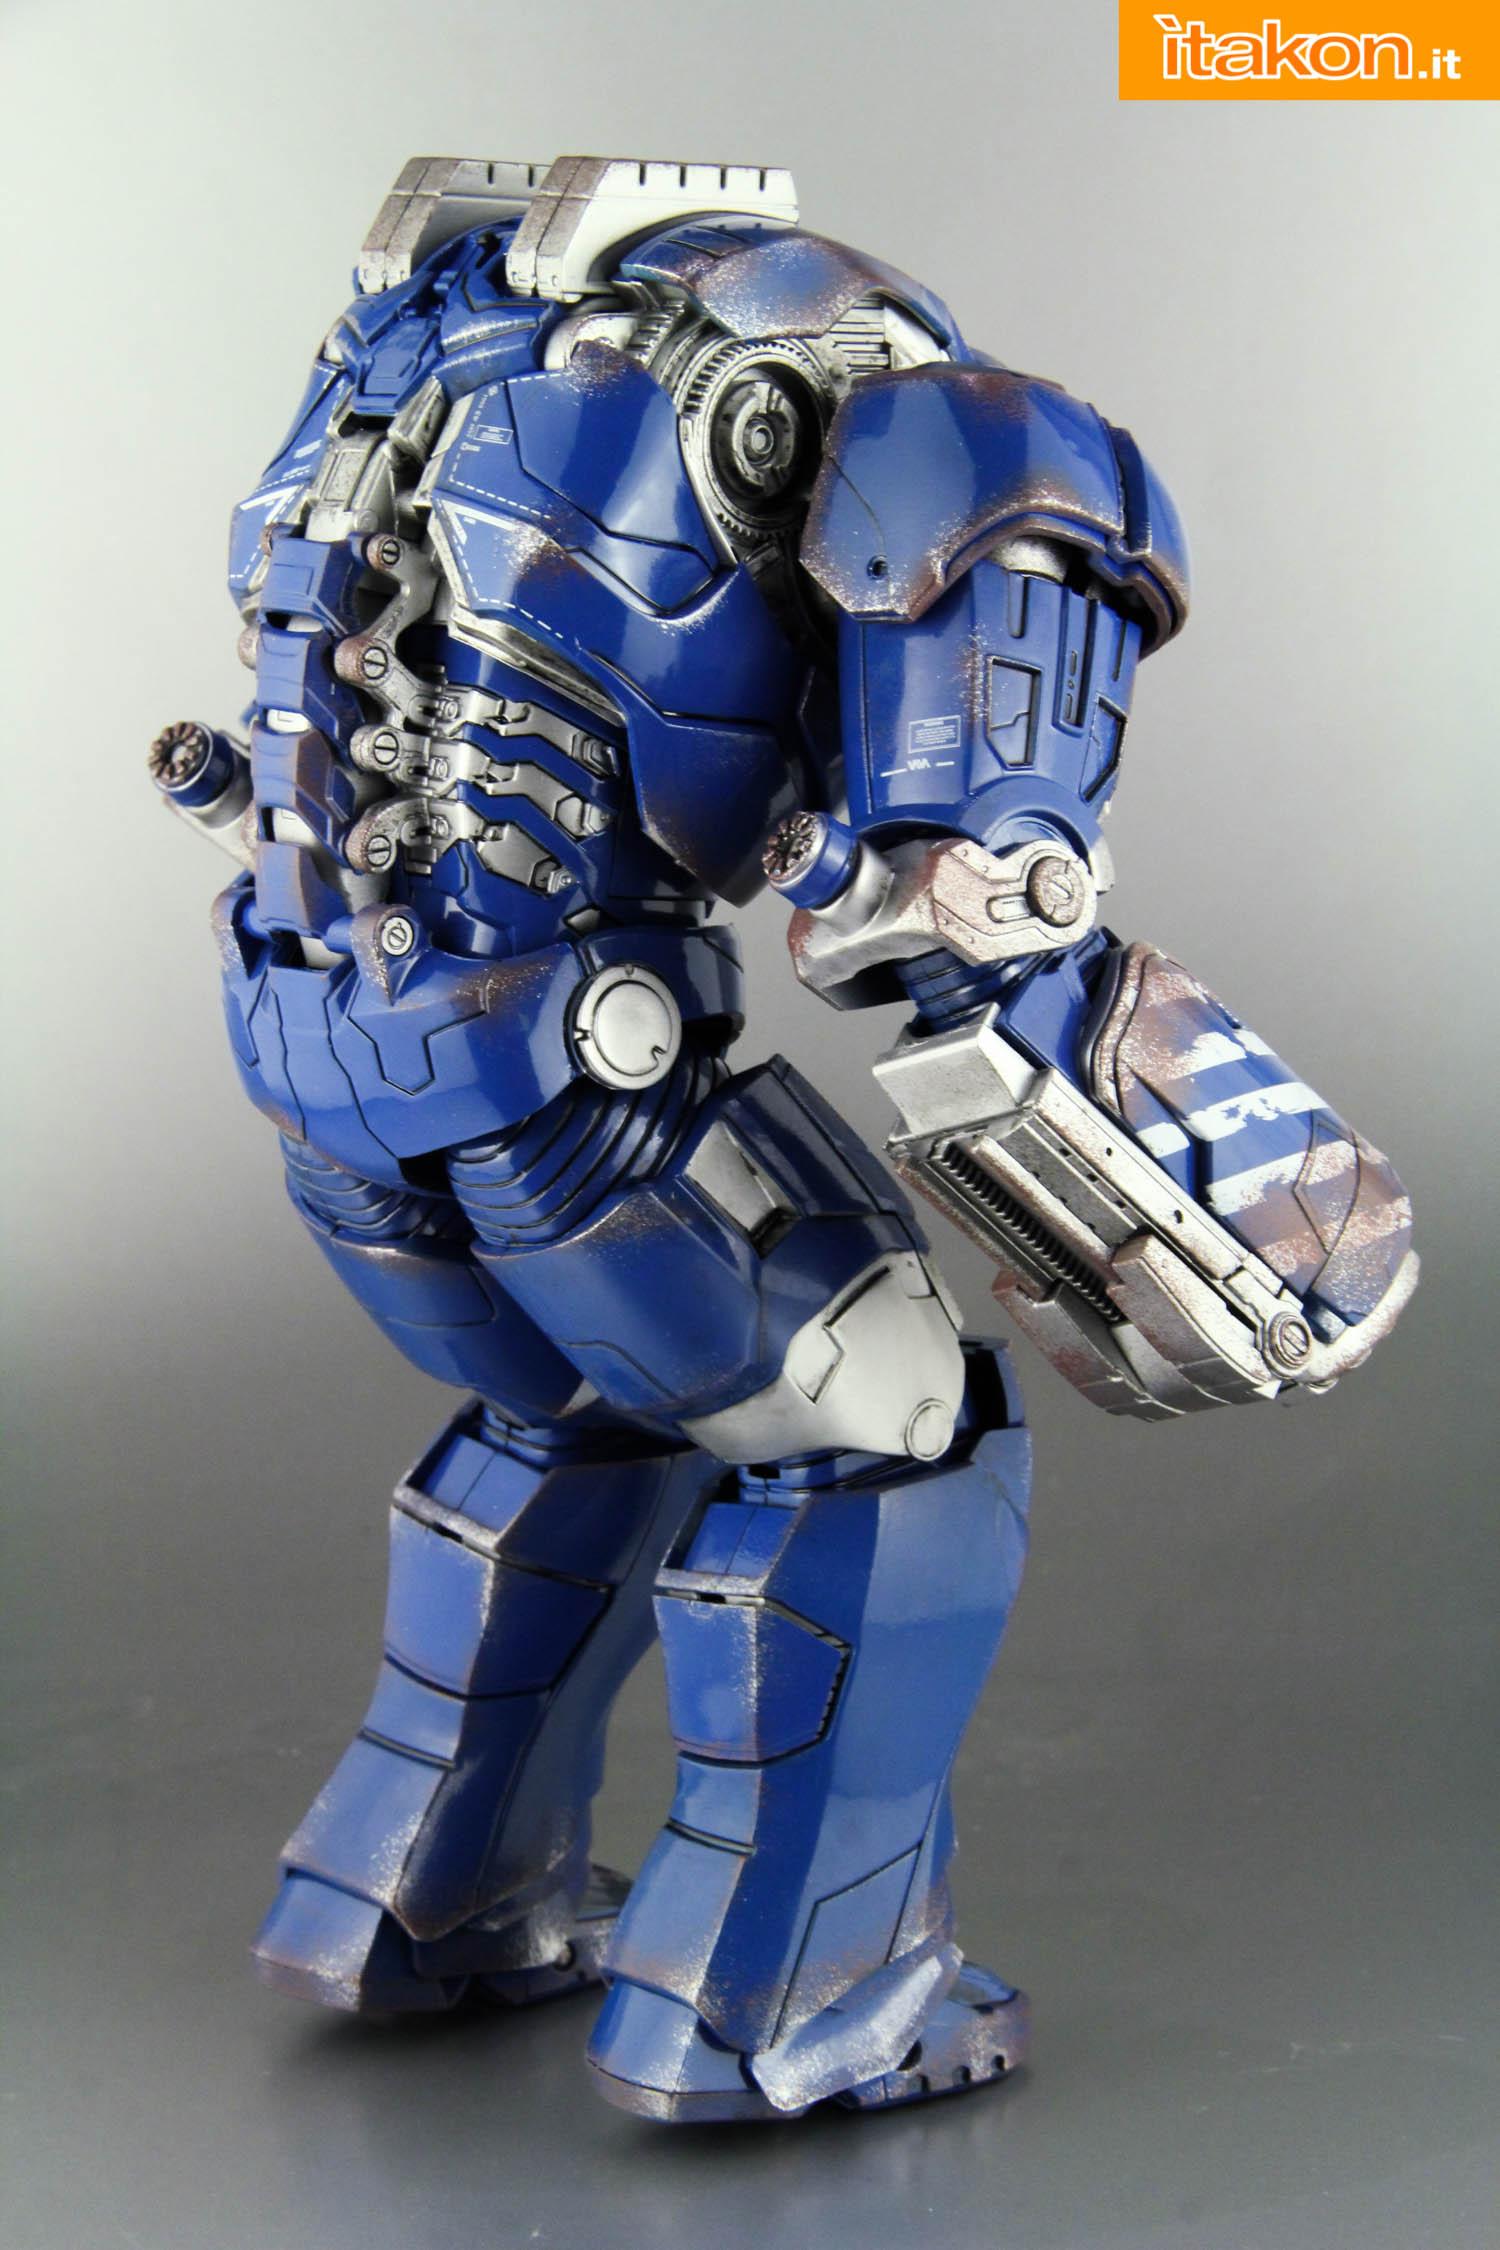 Link a comicave-igor-iron-man-figure-14